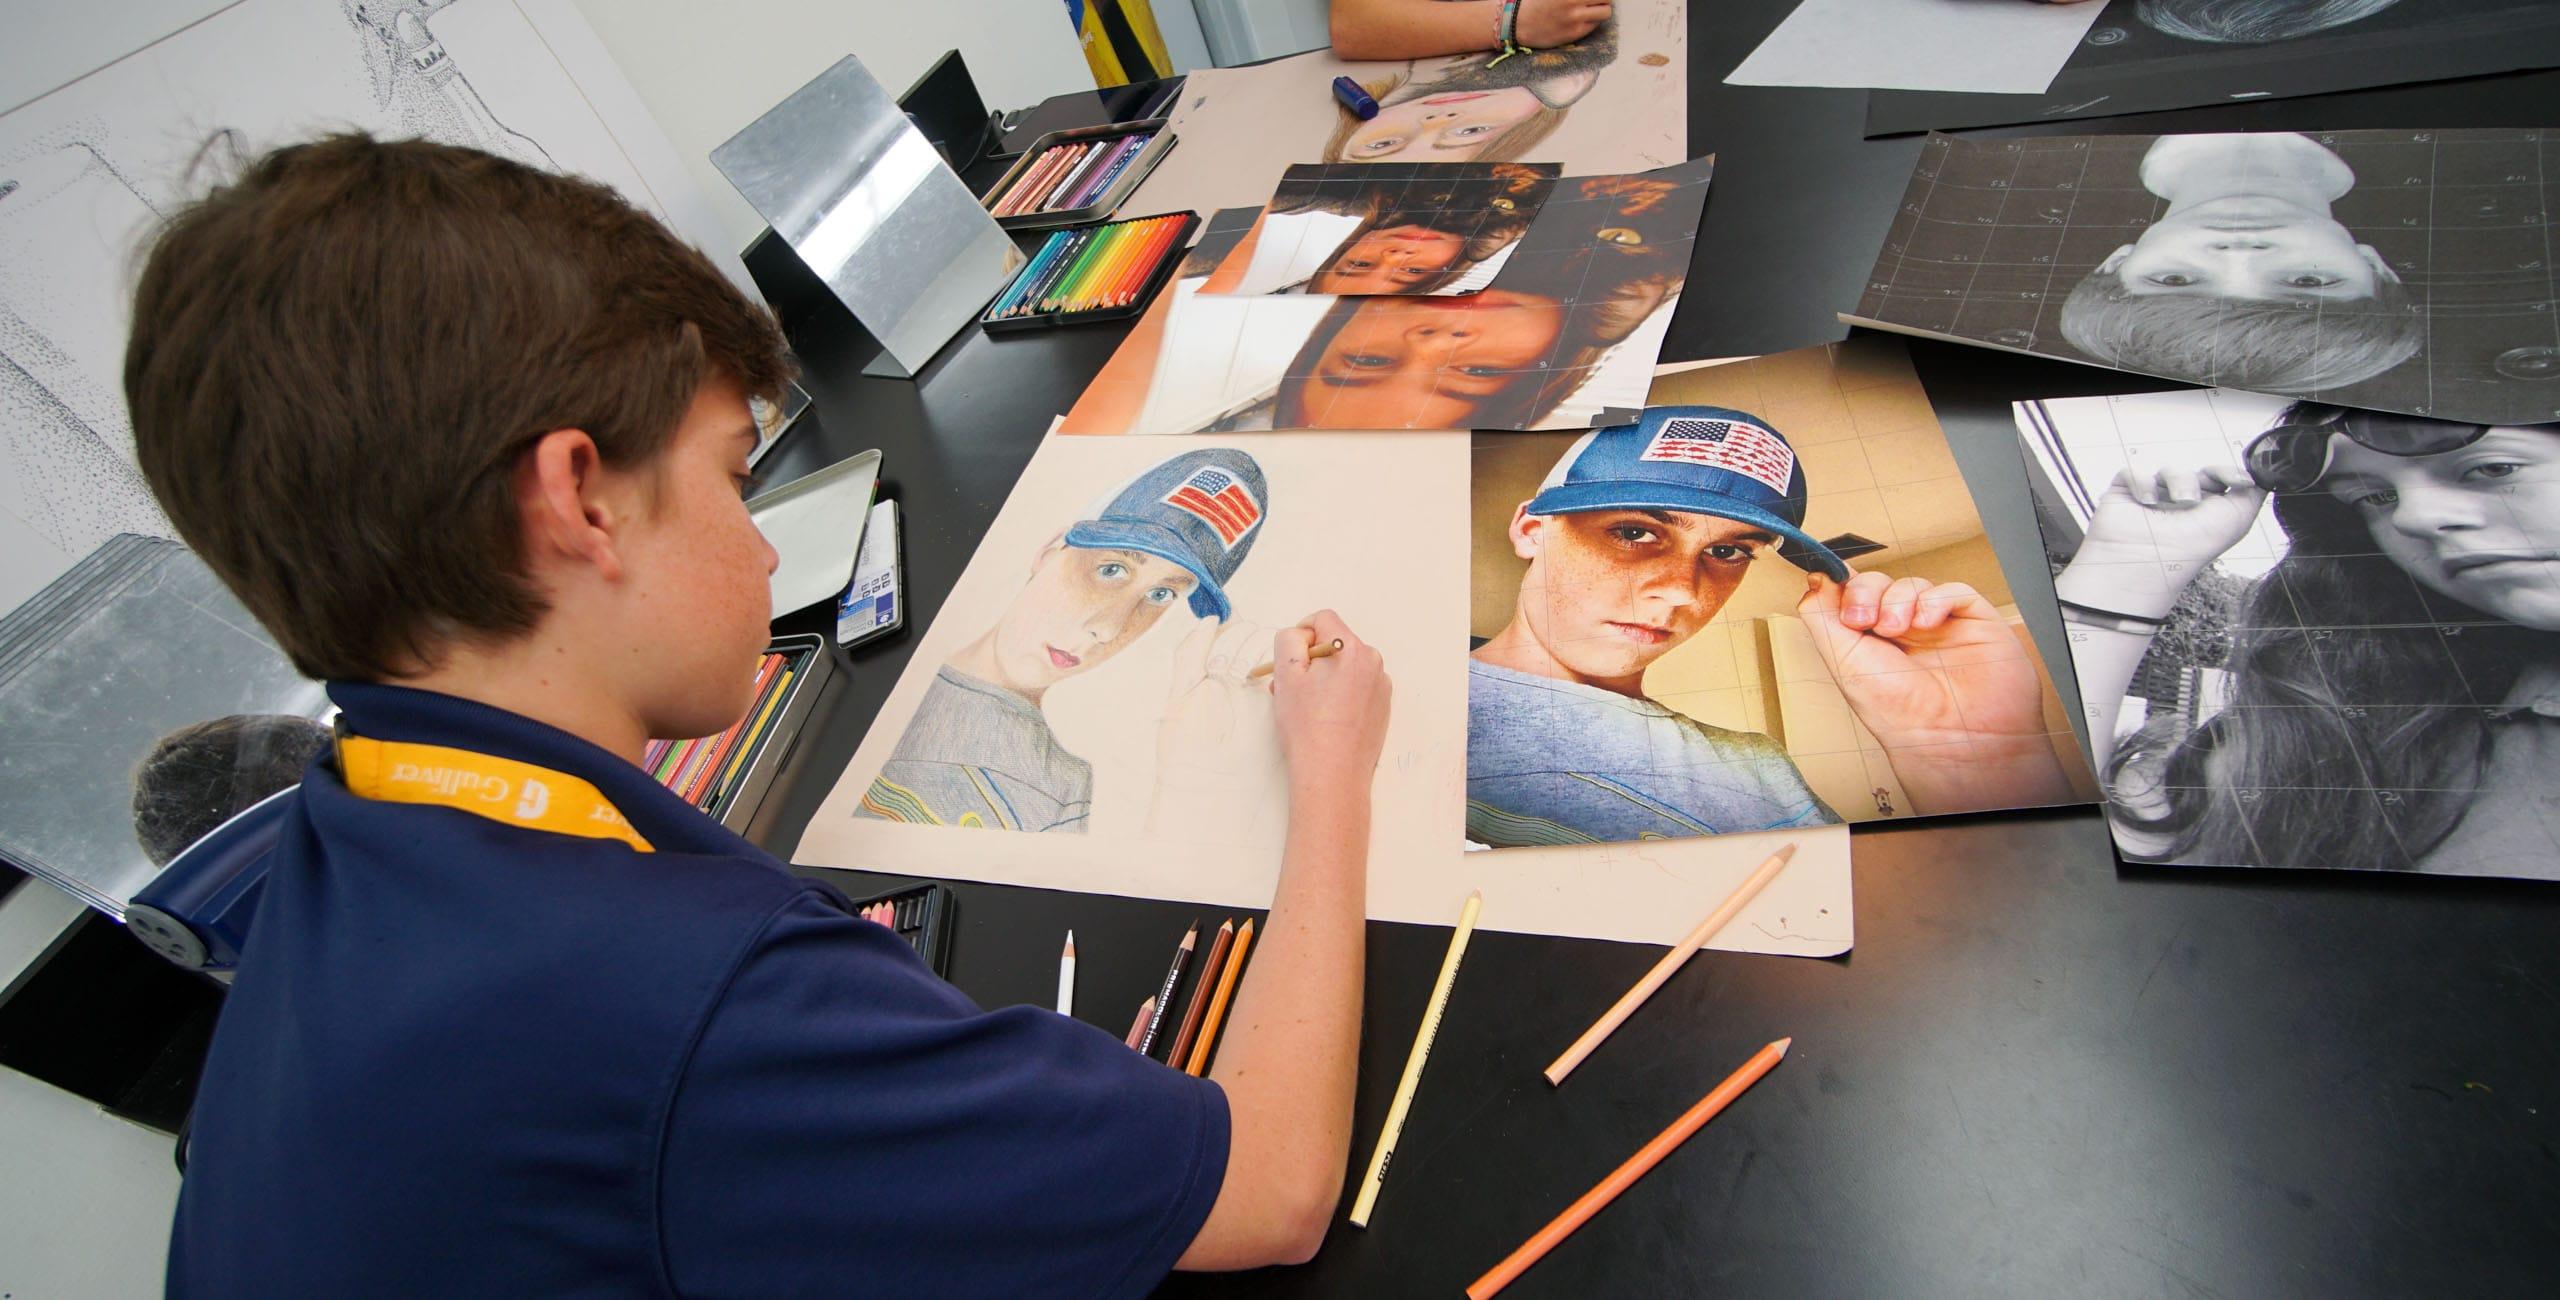 Male student coloring a self portrait